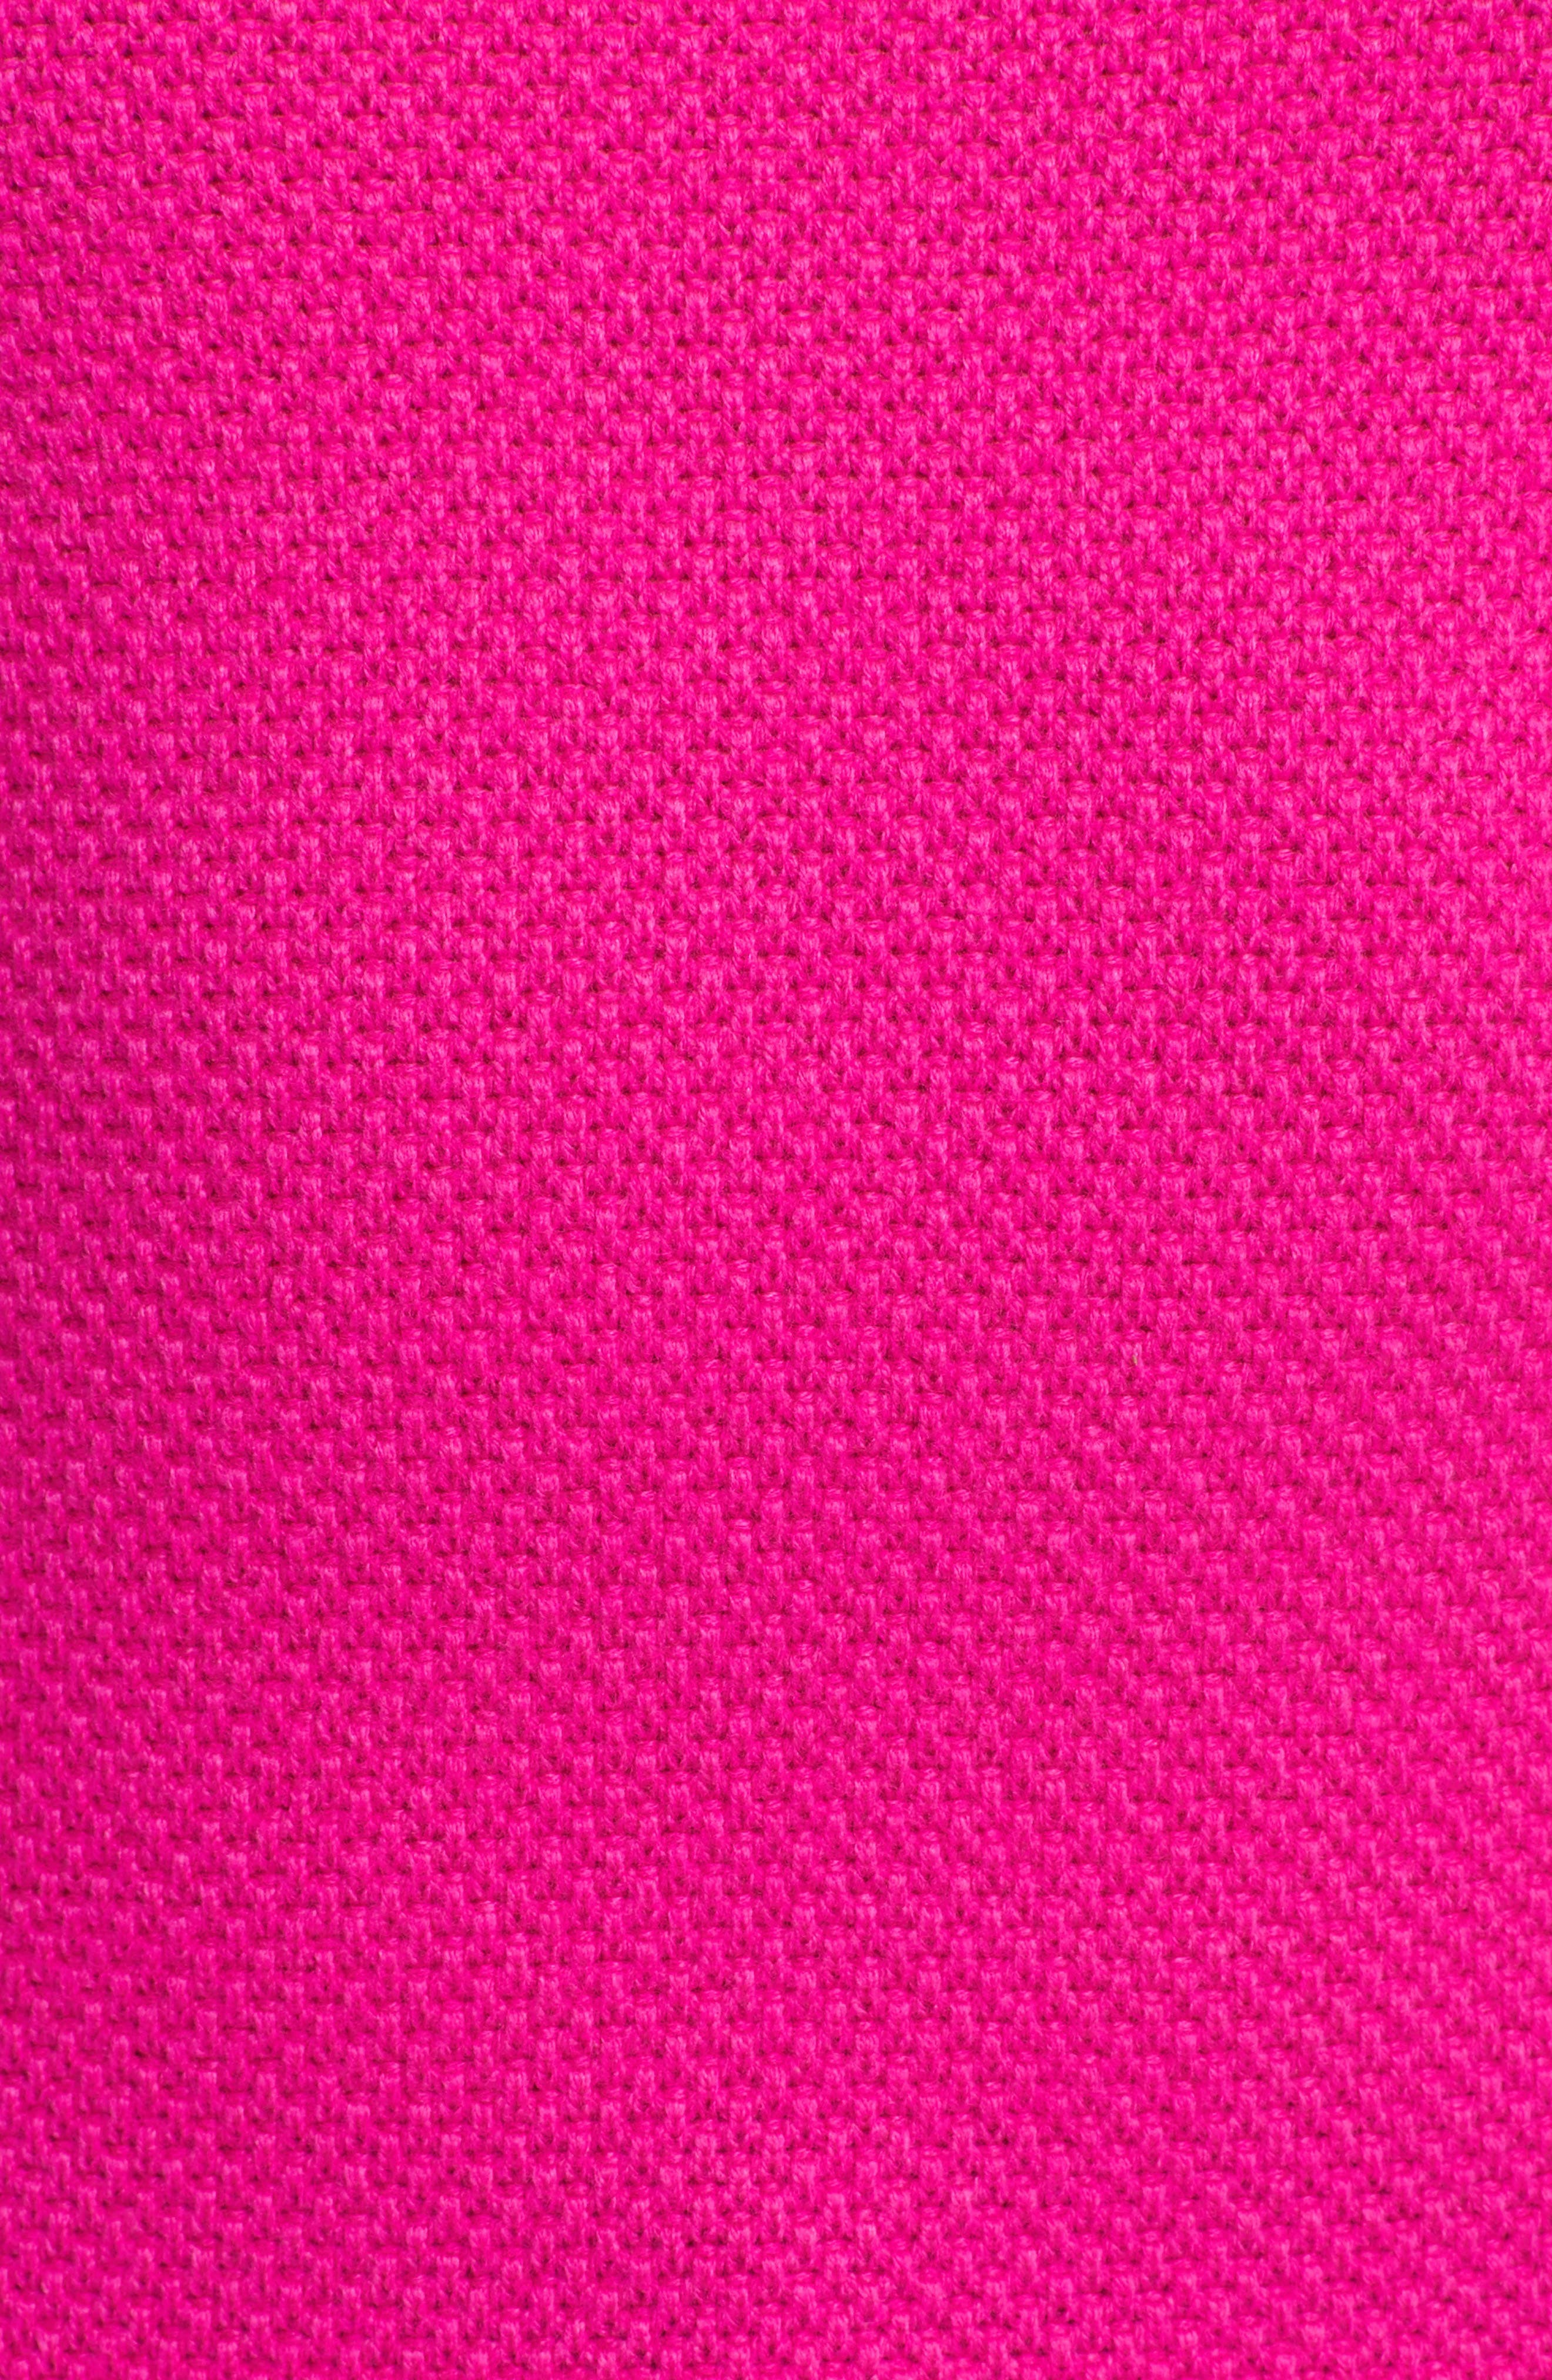 Textured Merino-Wool-Blend Sweater,                             Alternate thumbnail 5, color,                             670